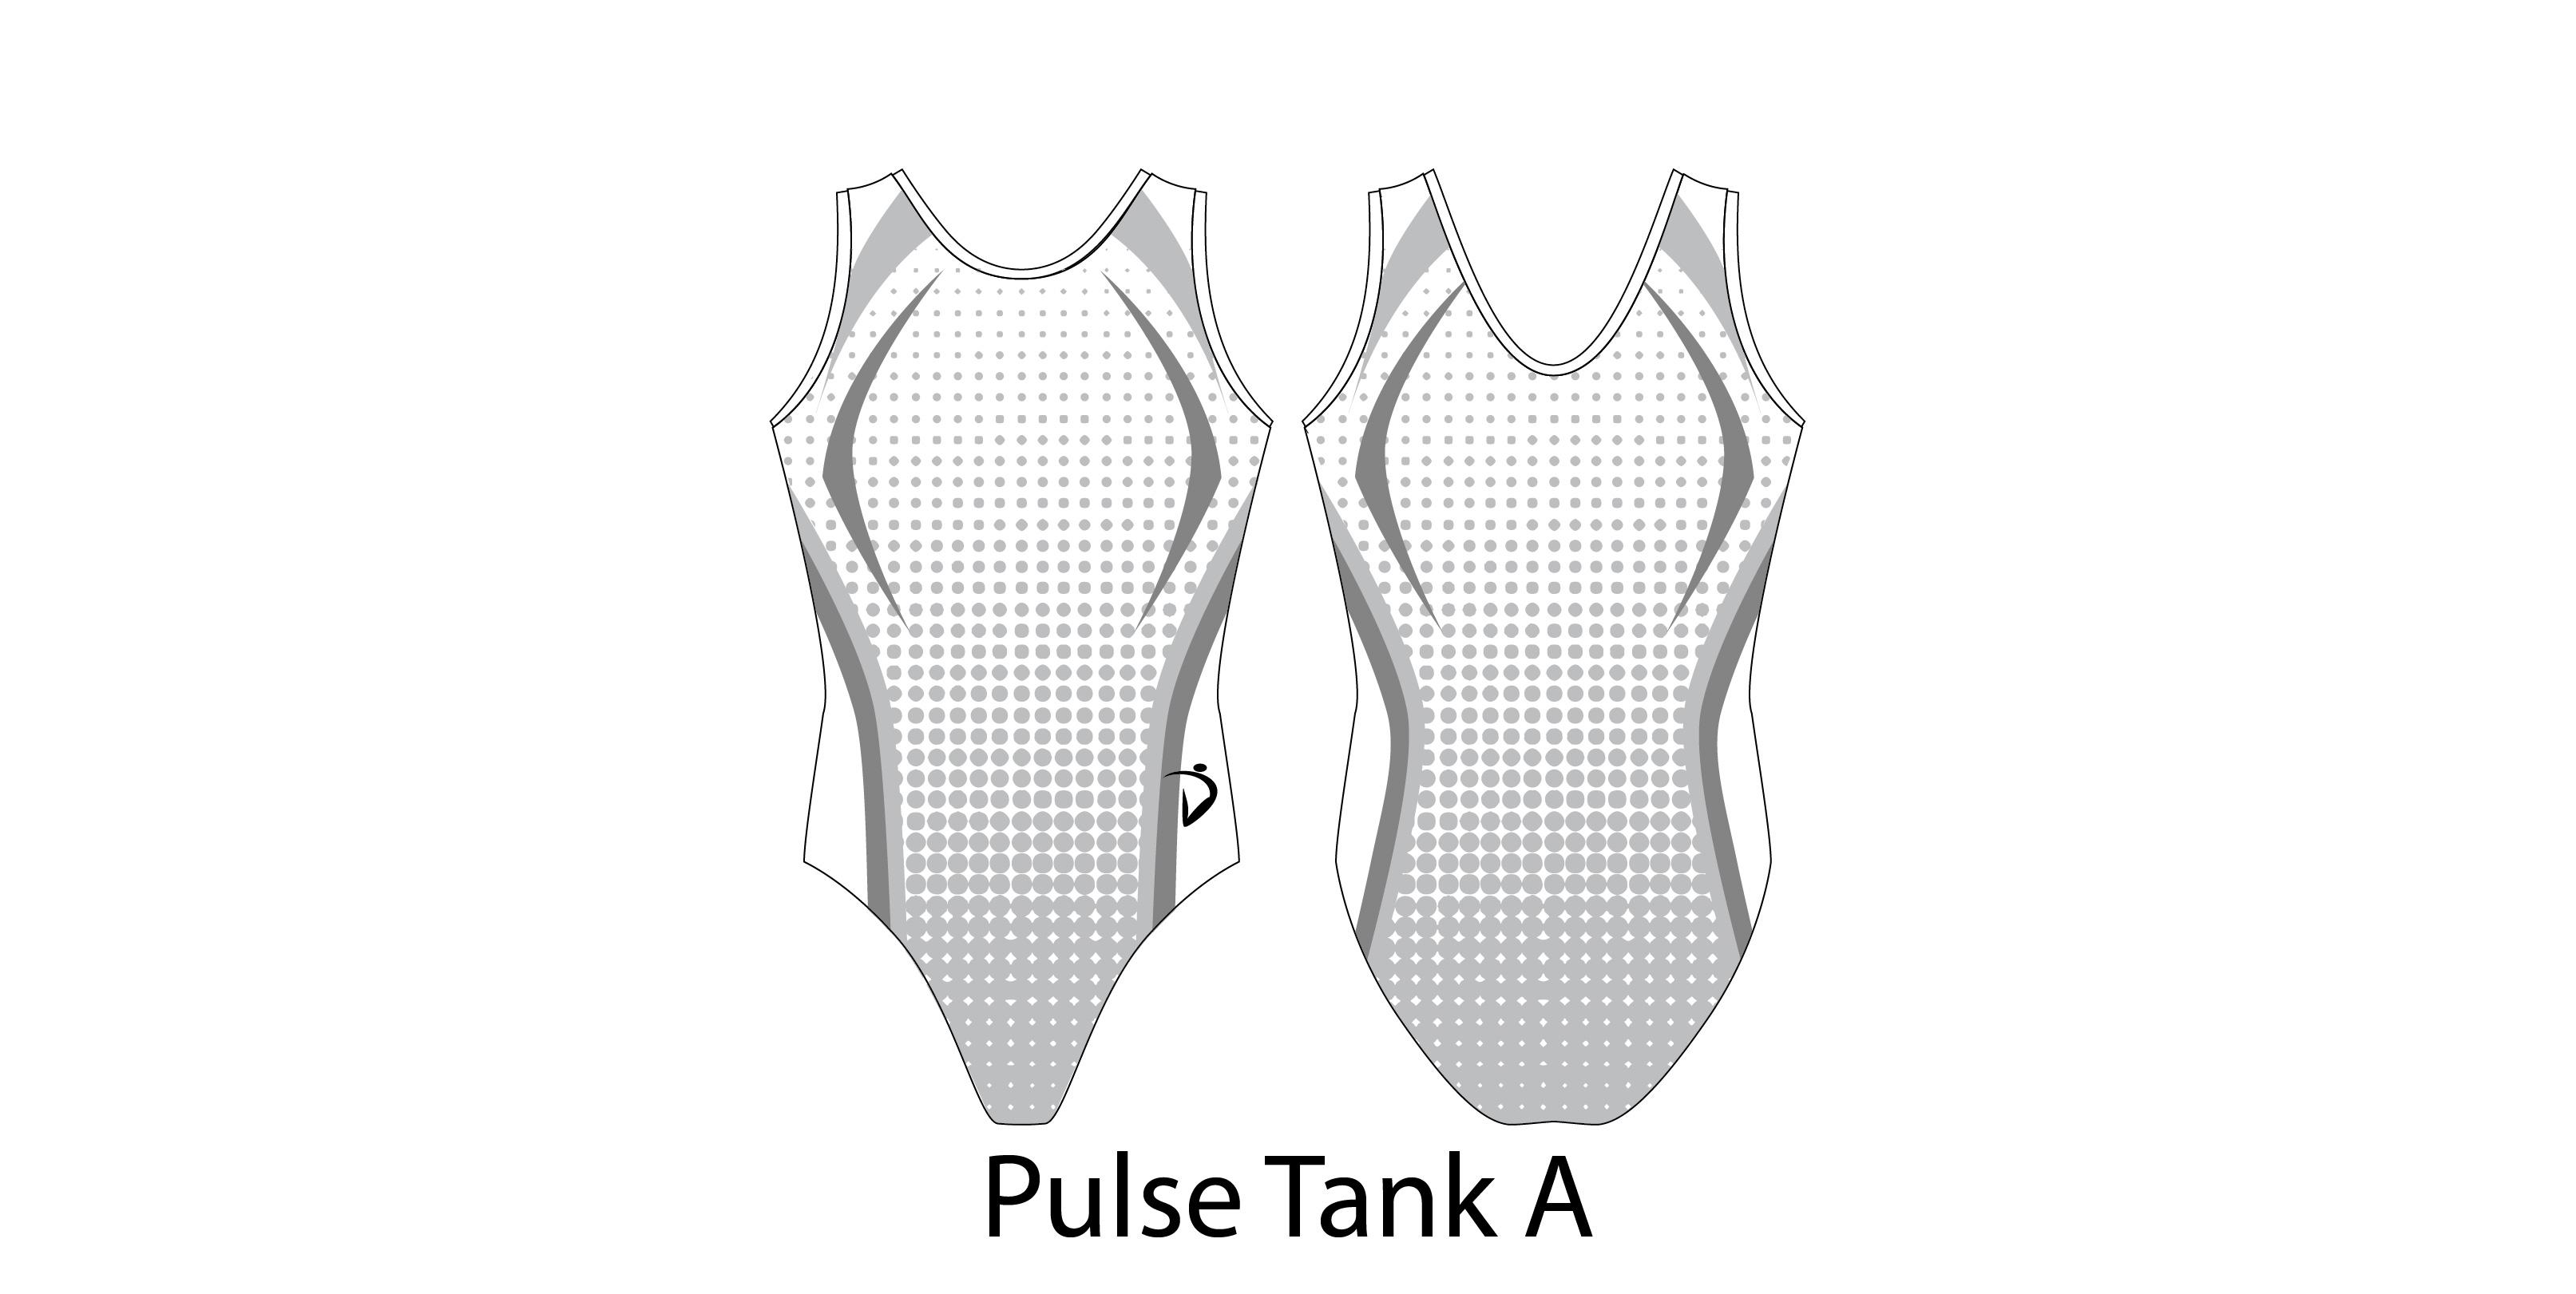 Pulse Tank A